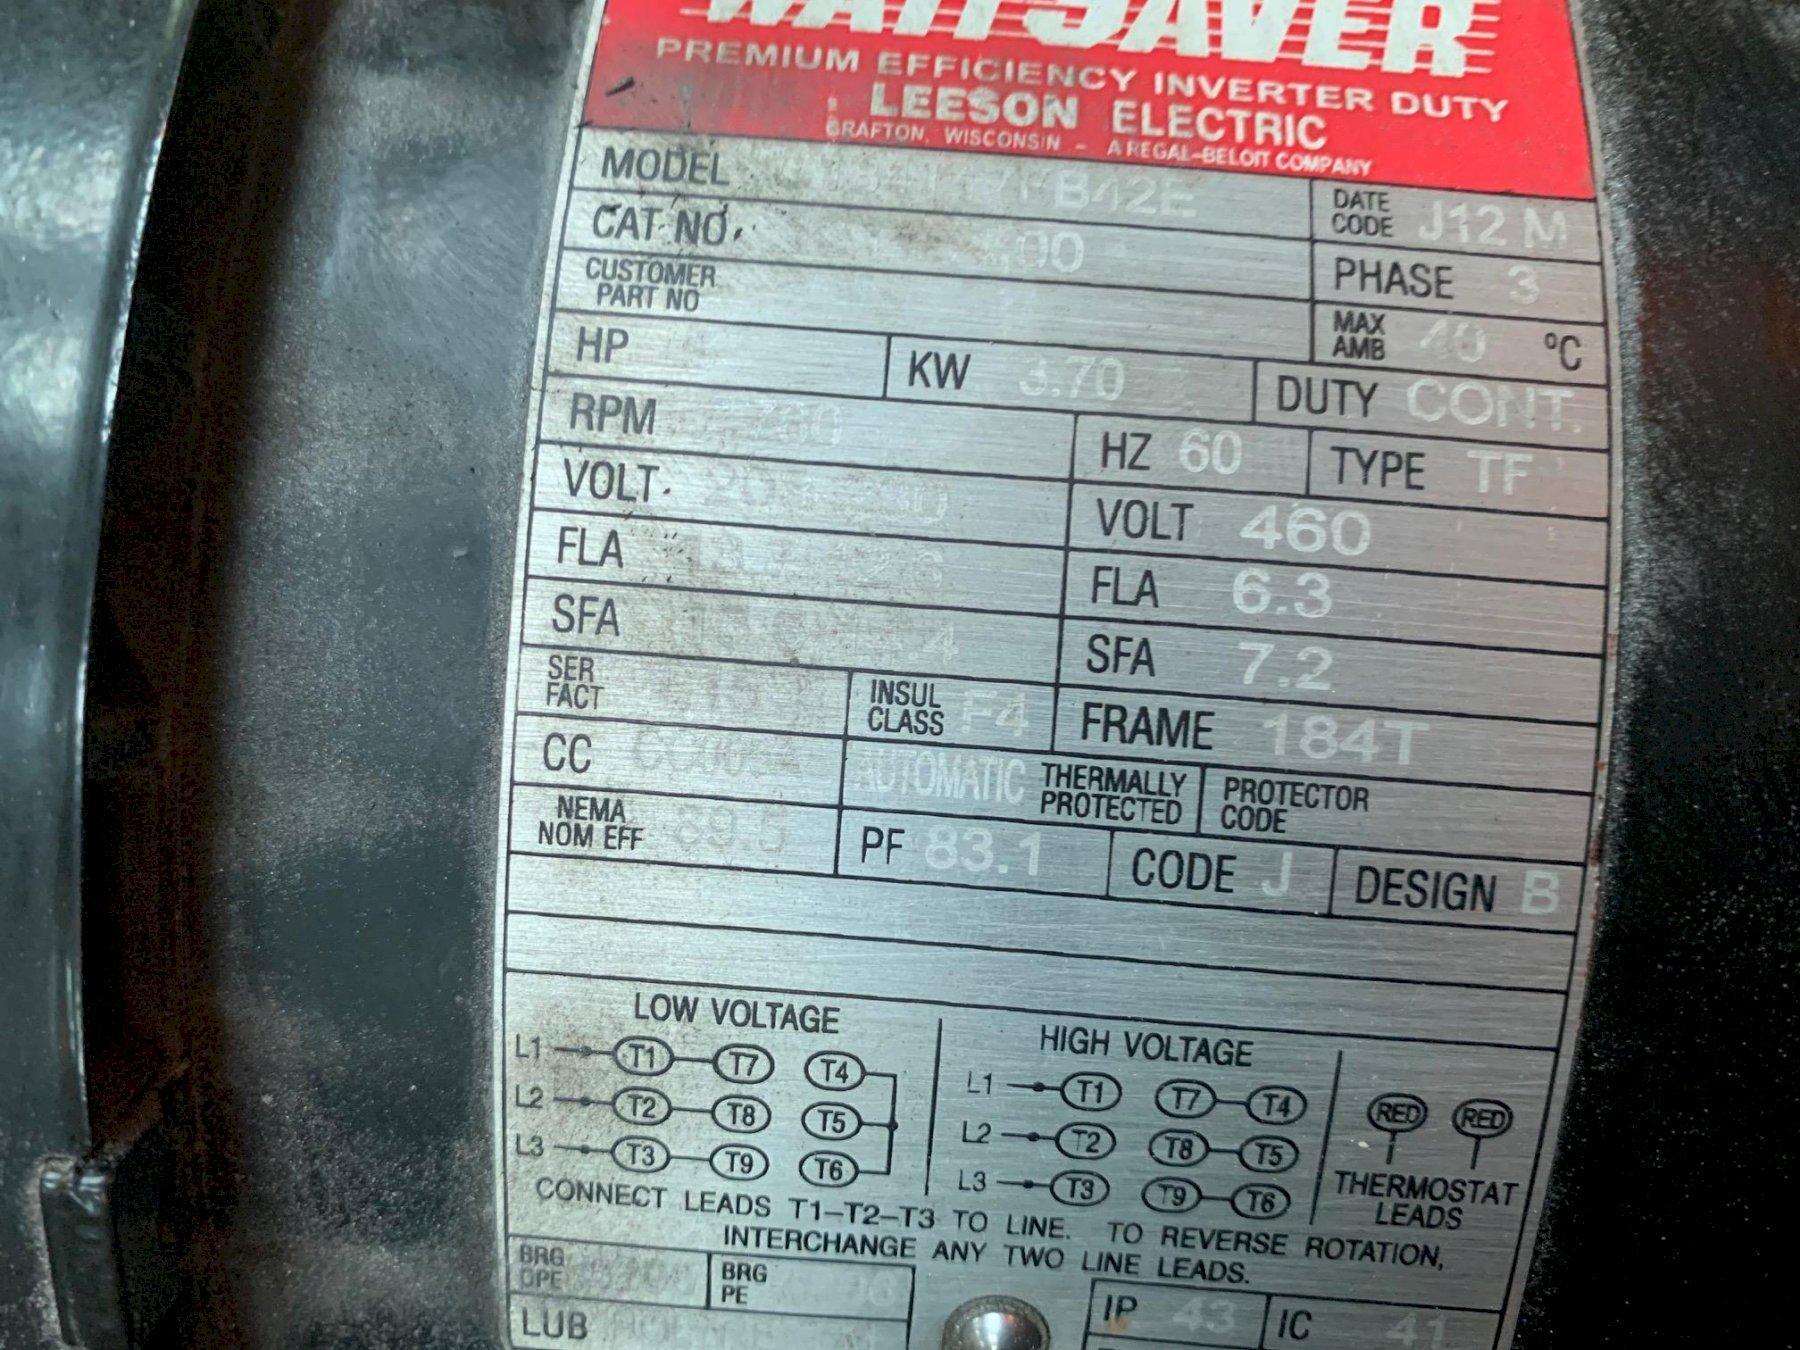 "3"" x 48"" HAVEN 960 DOUBLE END BRUSH DEBURR"